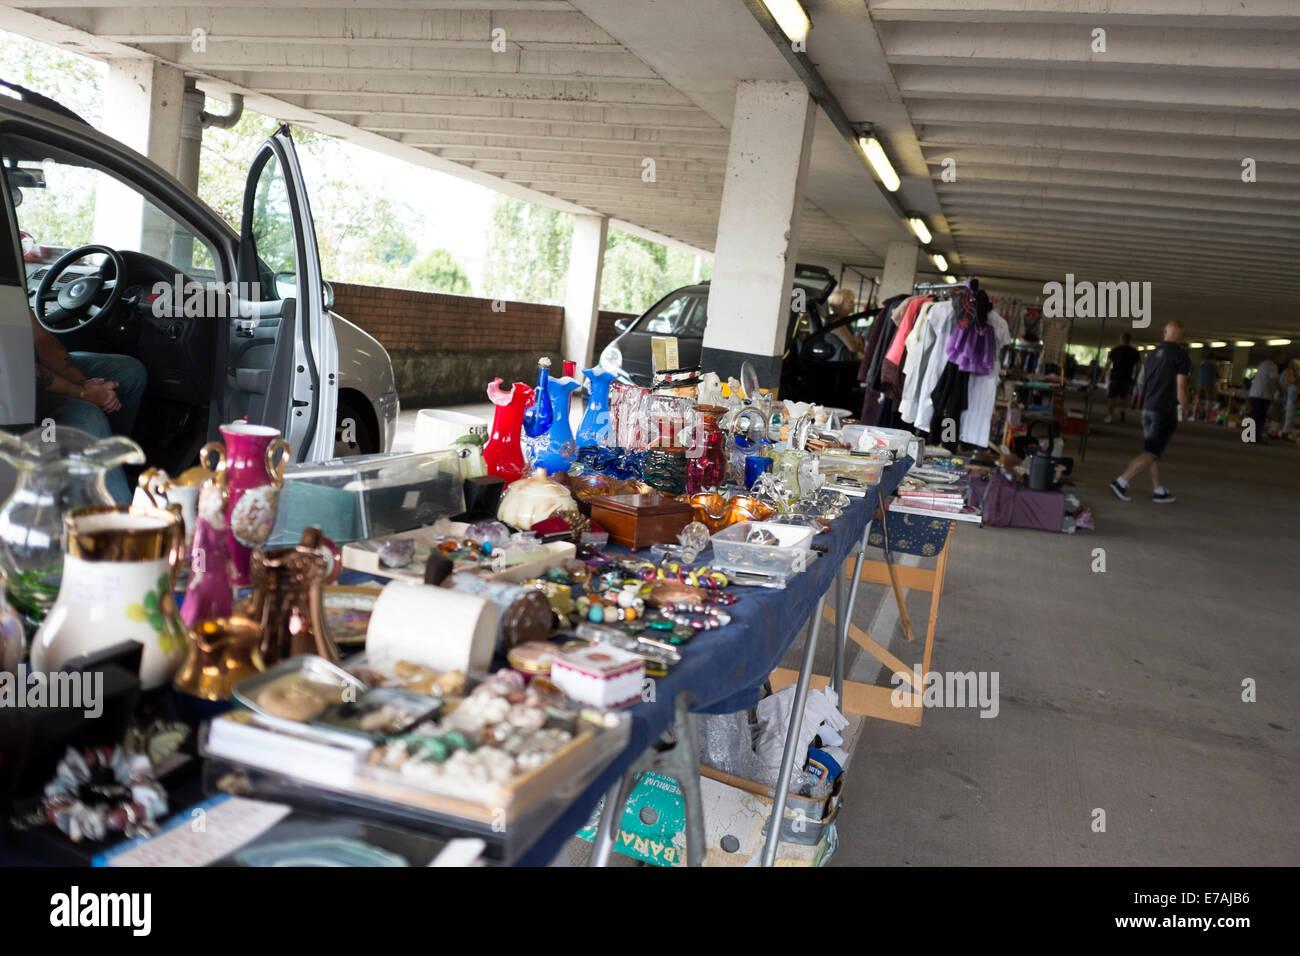 Car Boot Sale in Multi Story Car Park Attic Junk Stock Photo ...